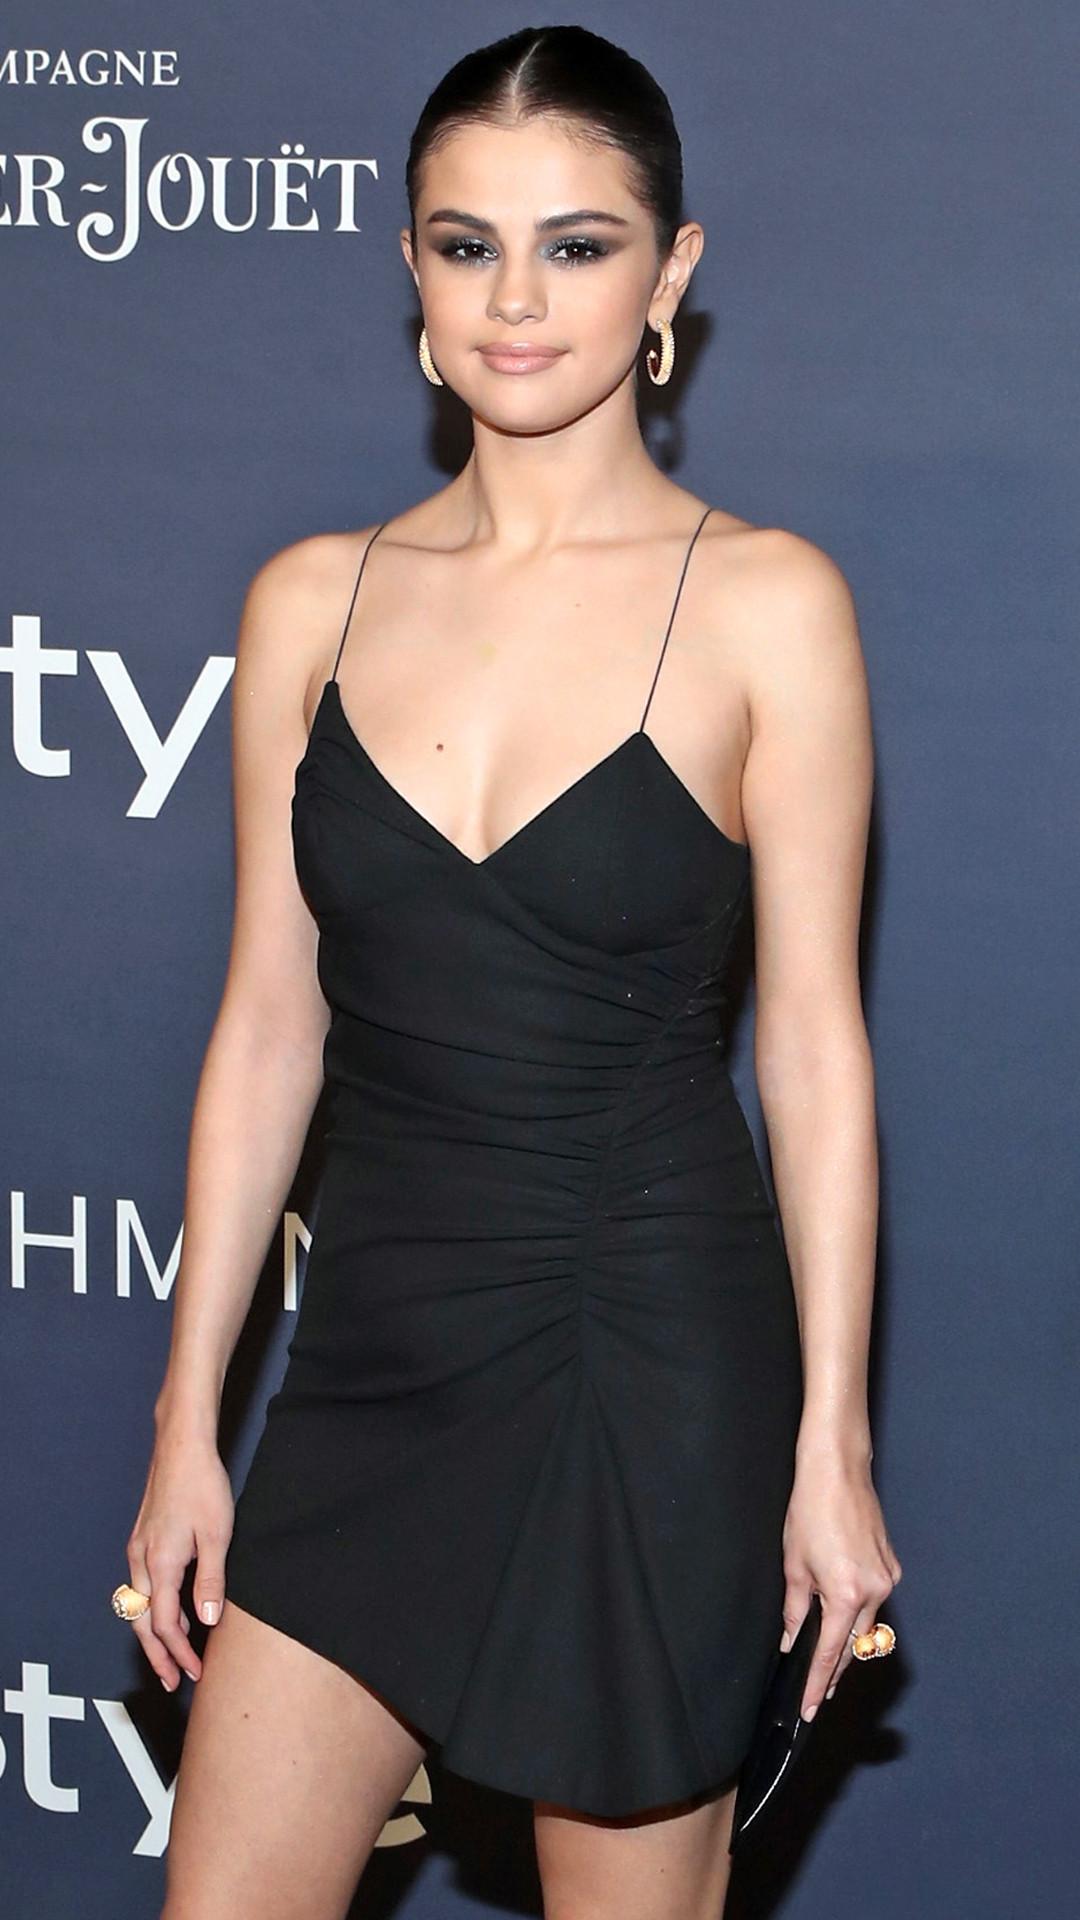 Selena Gomez, 2017 InStyle Awards